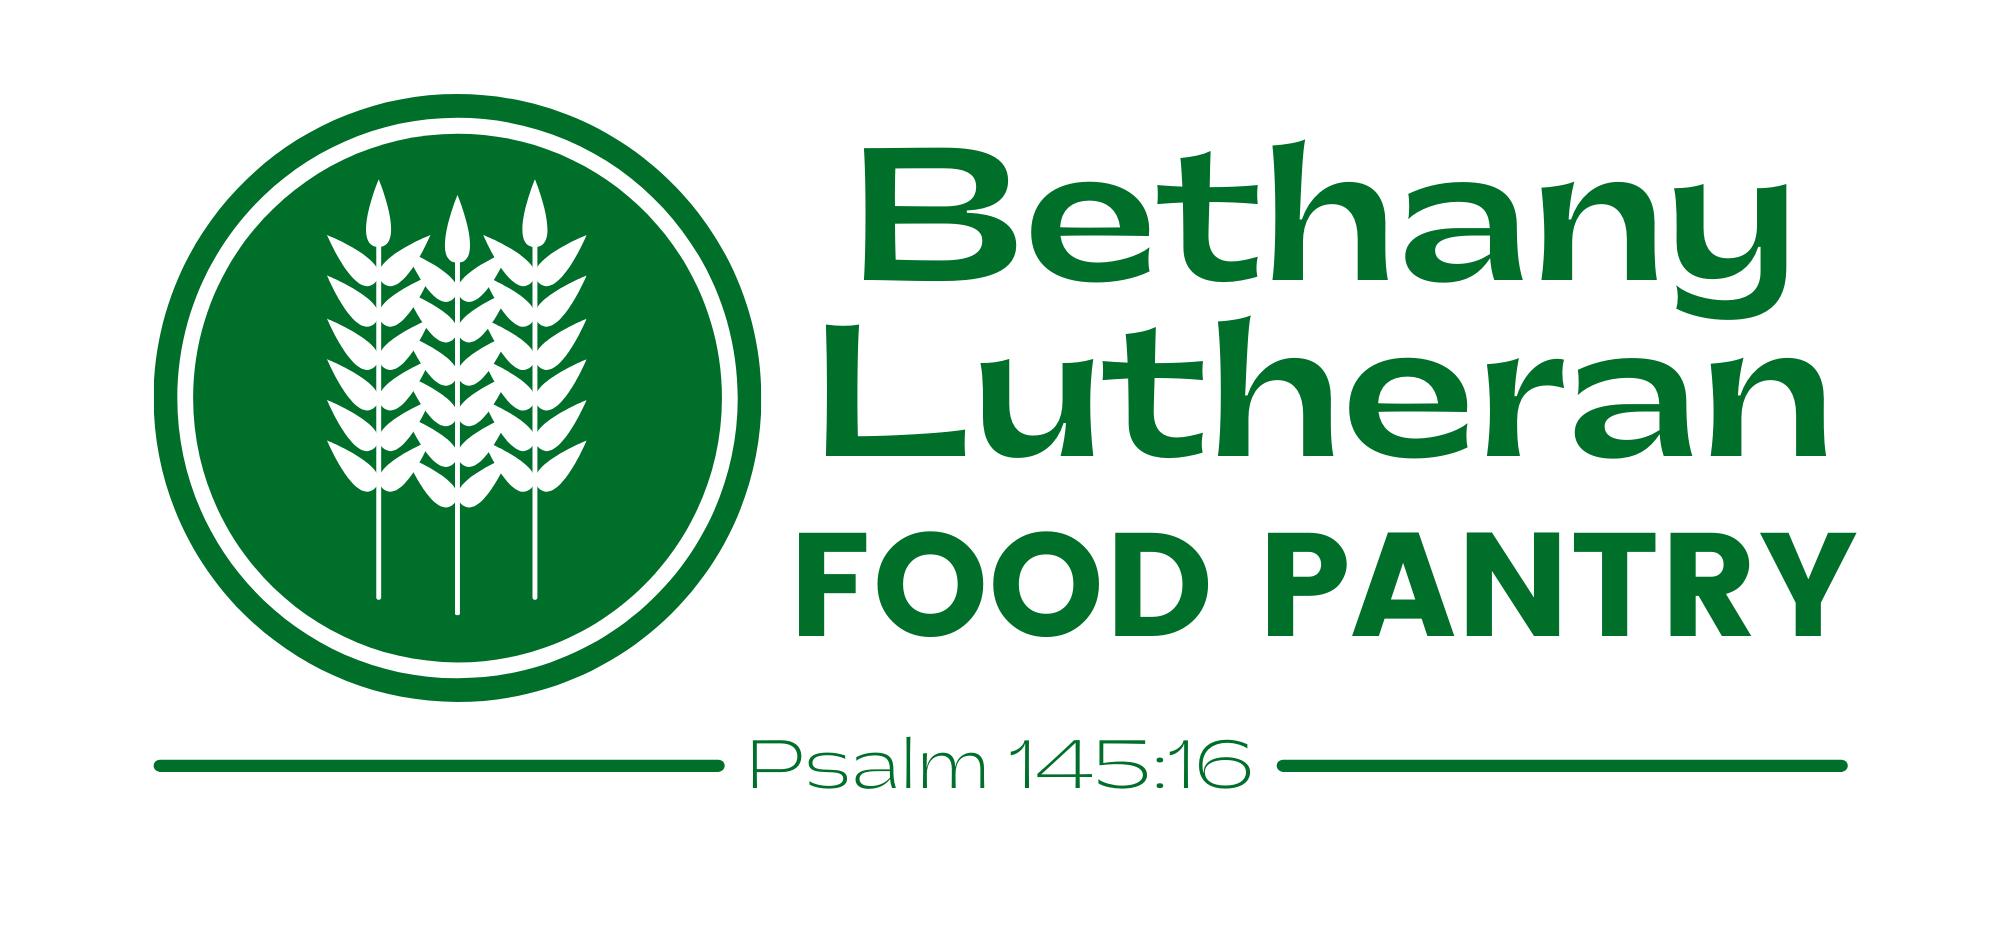 Food pantry logo Psalm 145